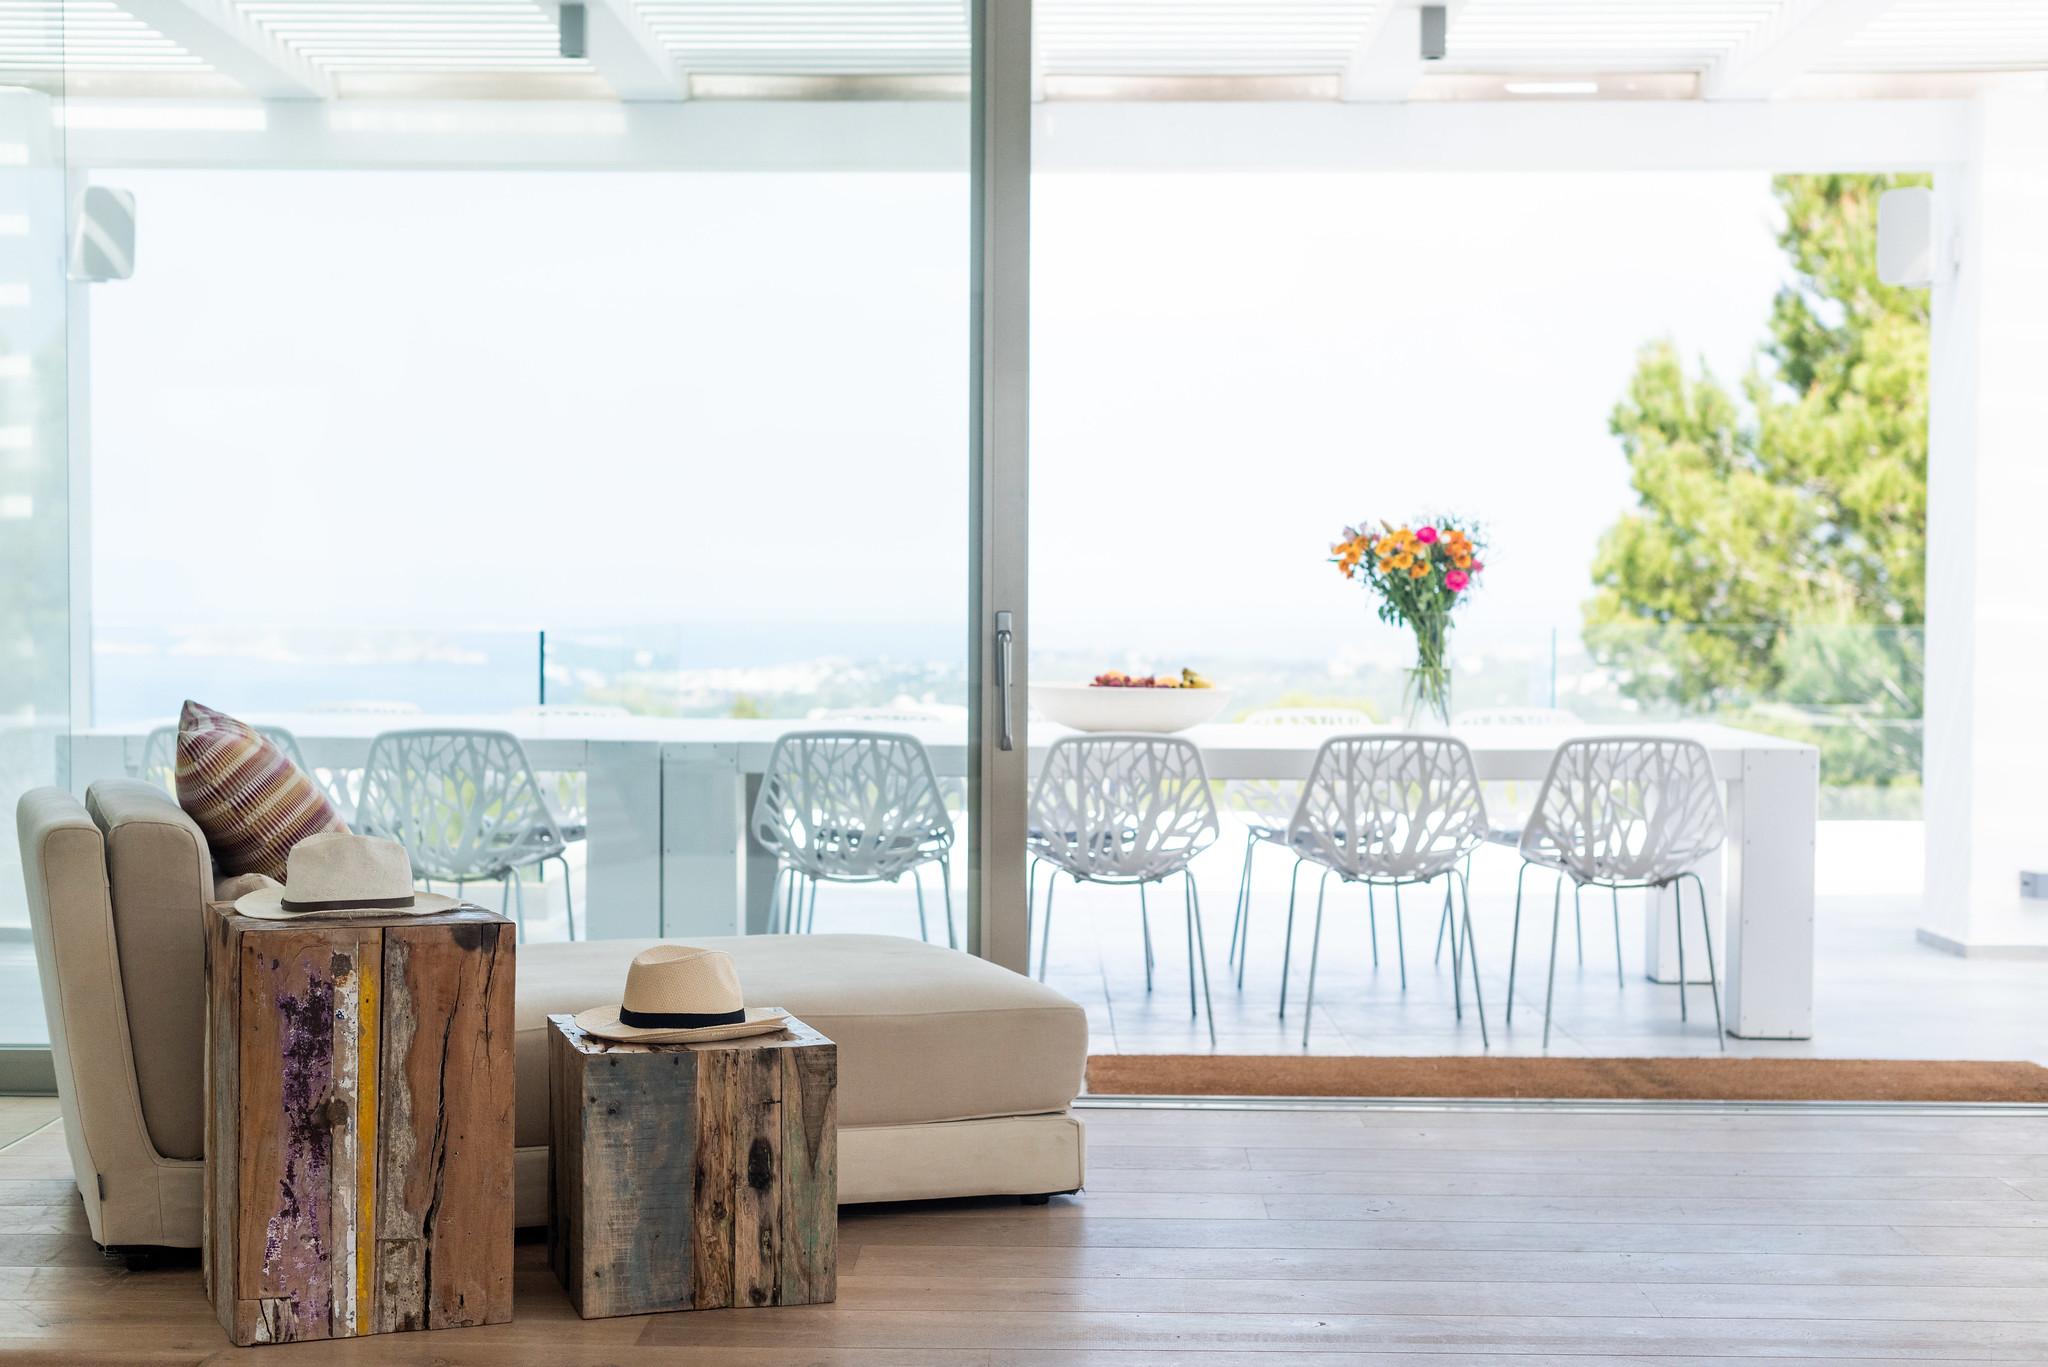 https://www.white-ibiza.com/wp-content/uploads/2020/05/white-ibiza-villas-can-dela-view-from-living-room.jpg